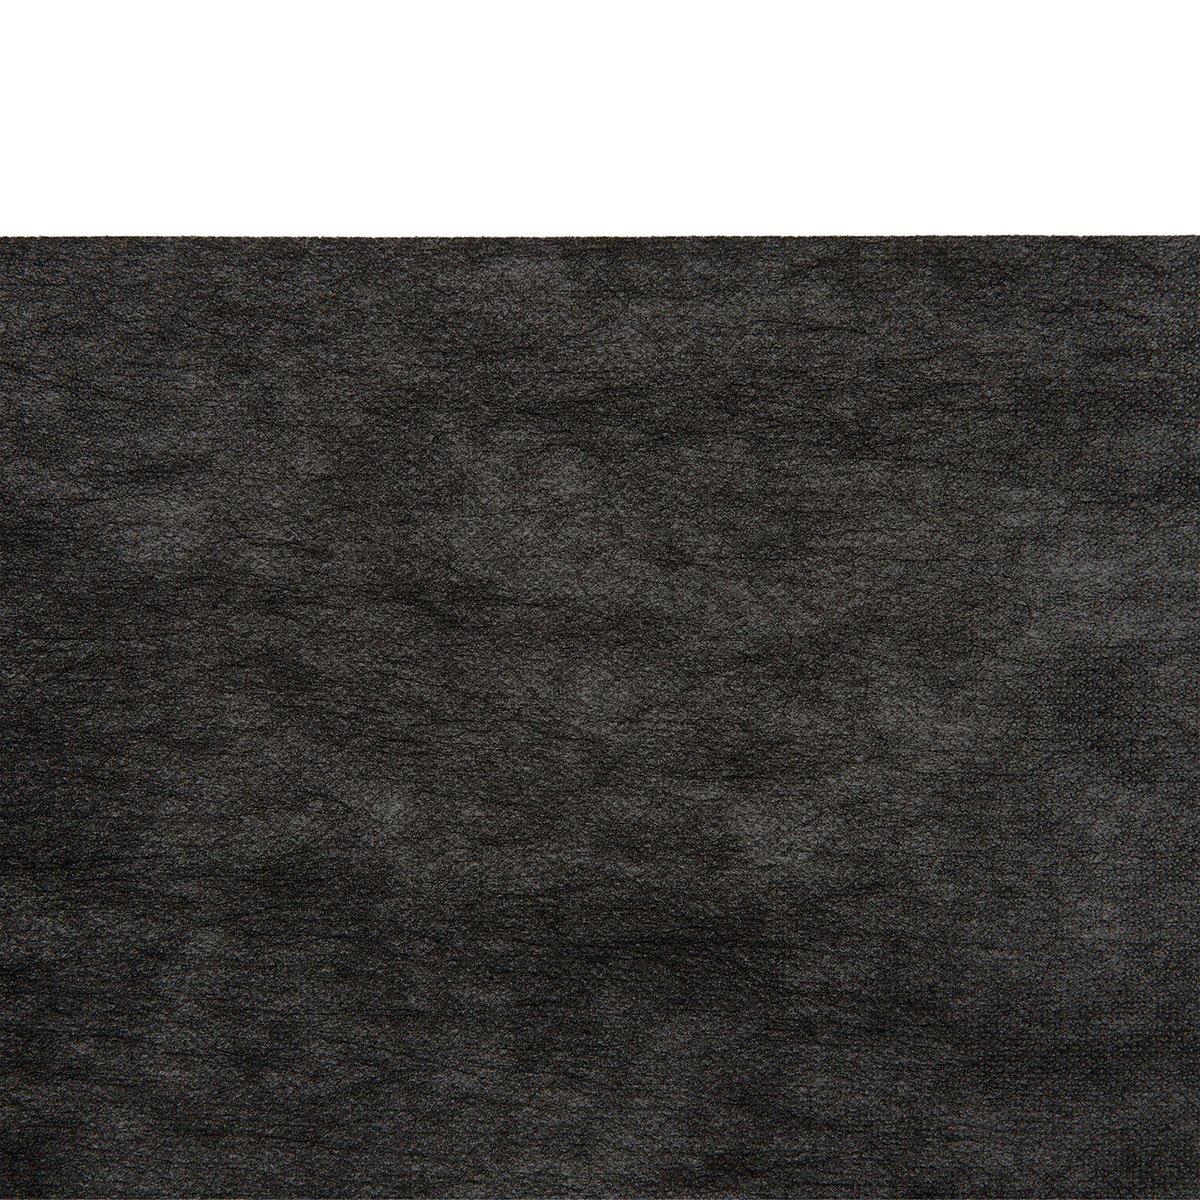 HaGa/® Gartenvlies Unkrautvlies f/ür Gem/üsebeet 50g//m/² in 1,6m Br. Meterware